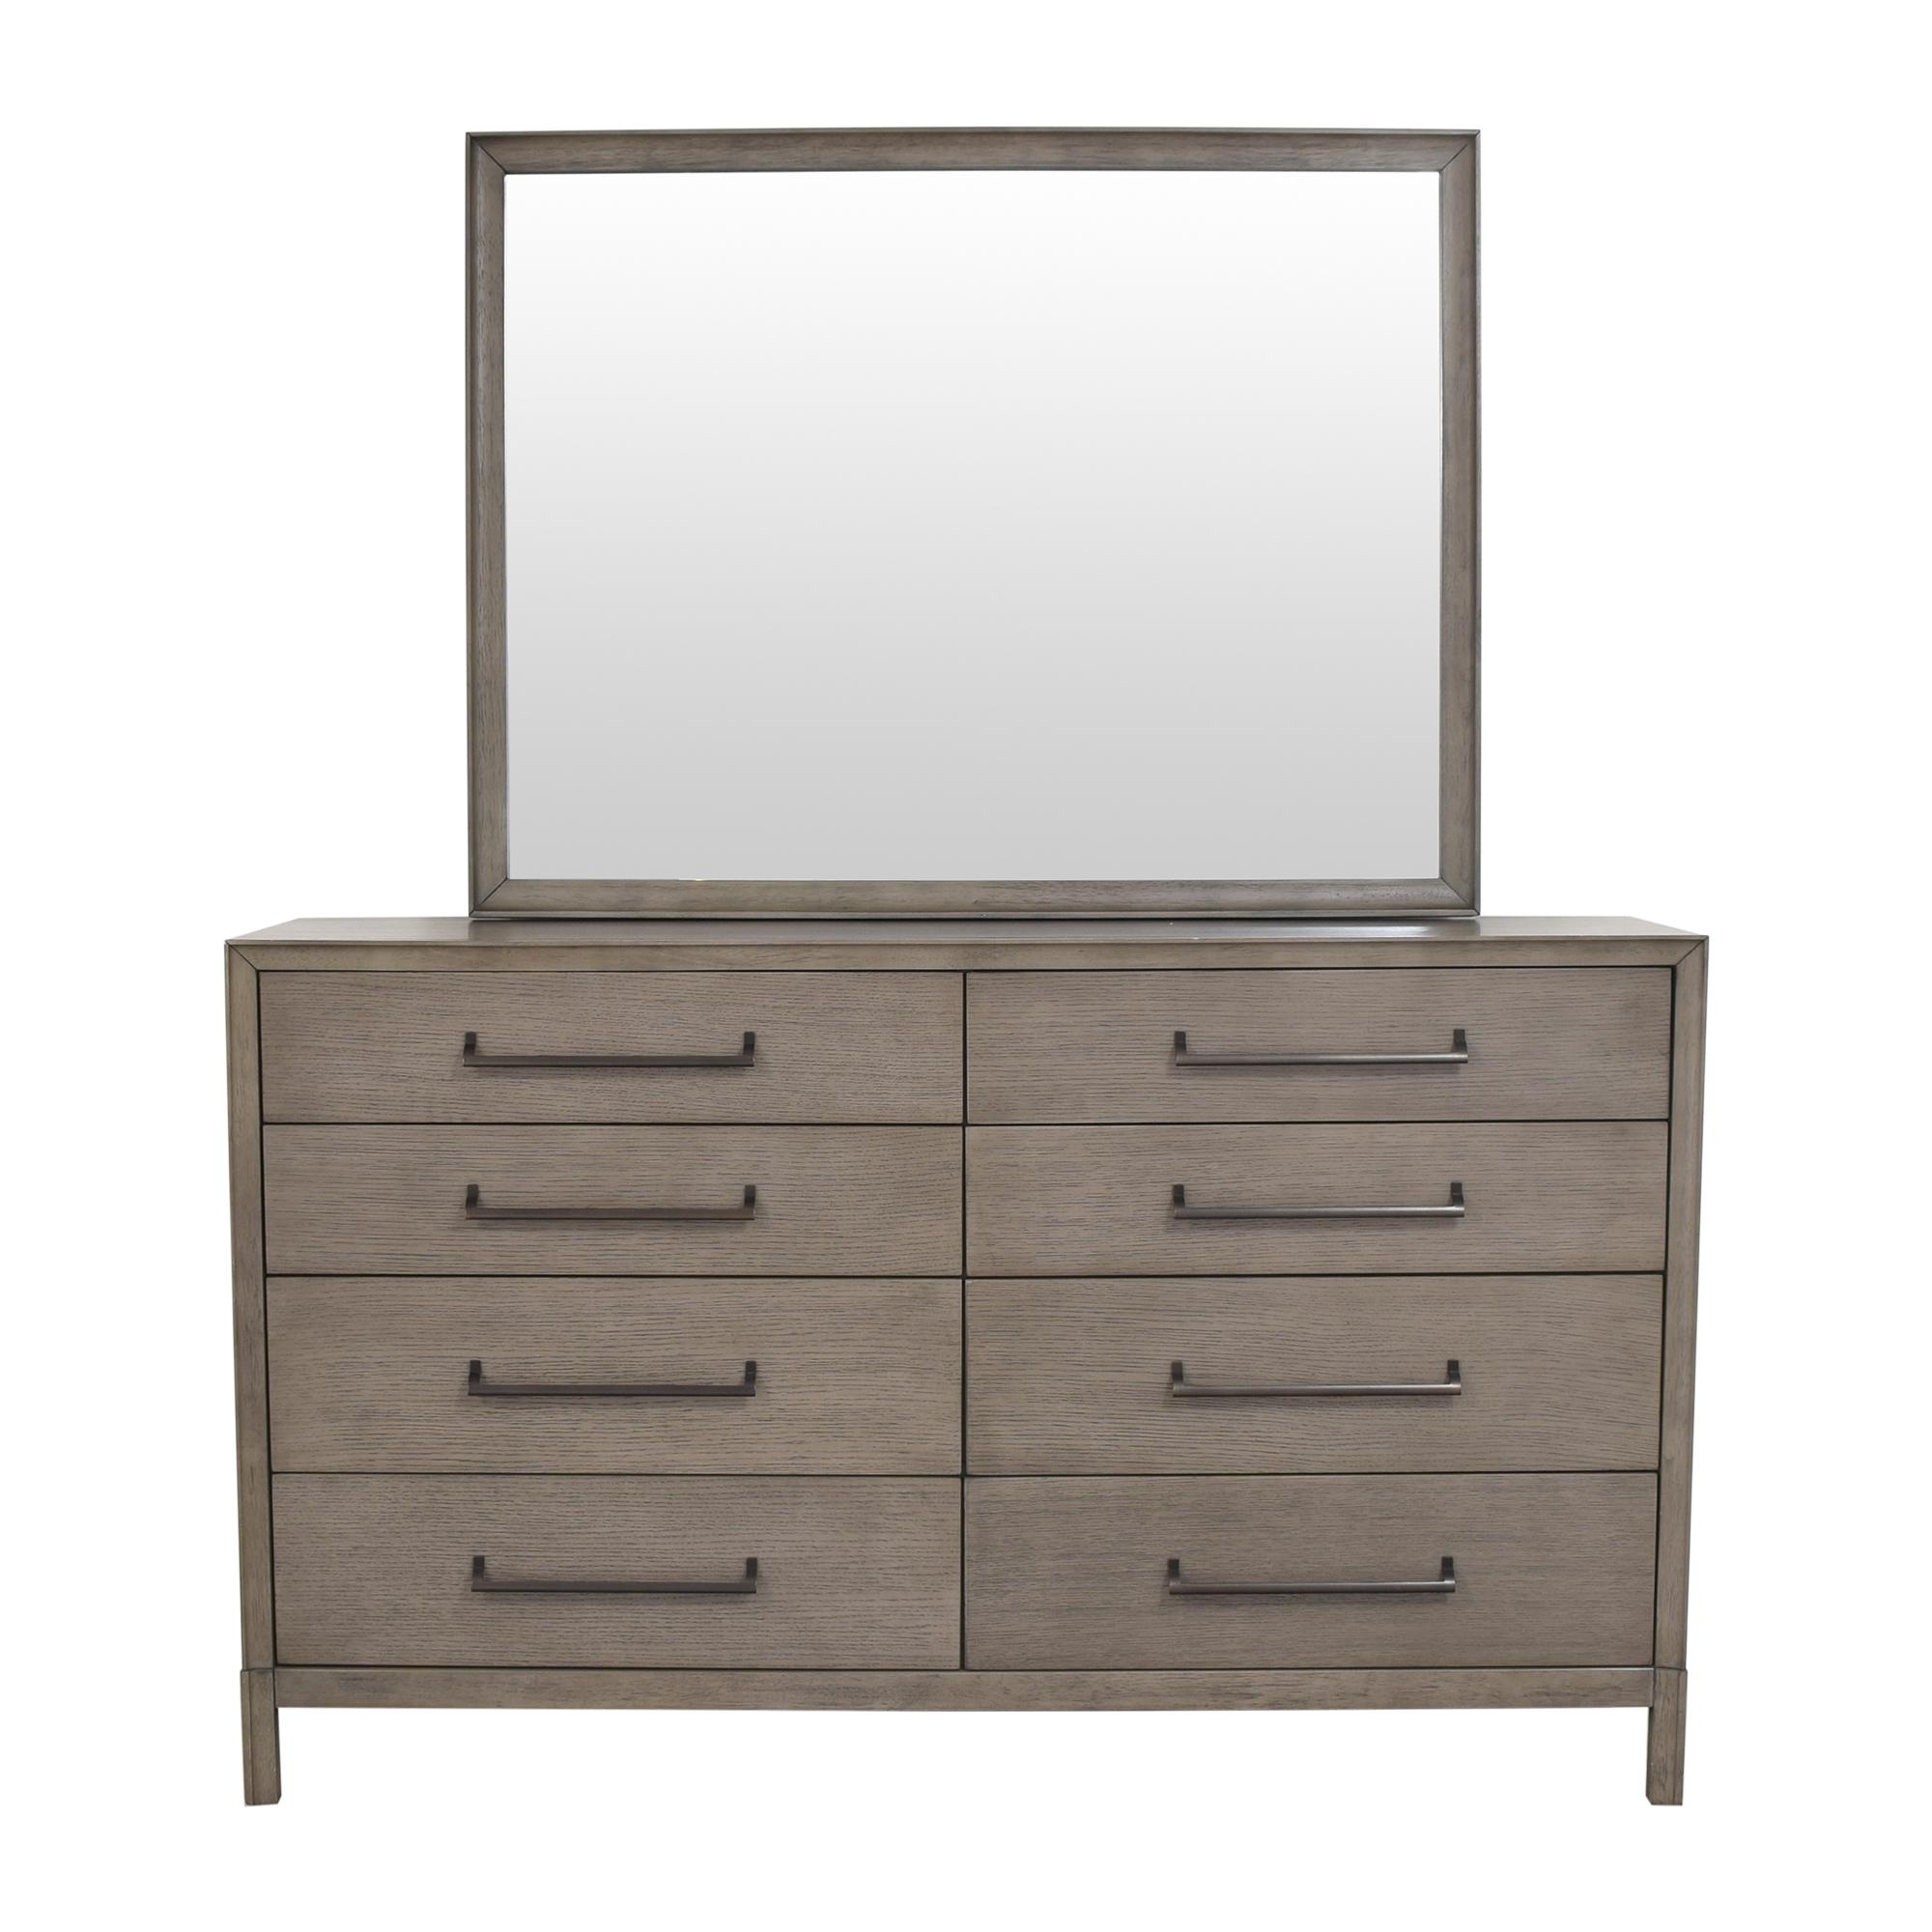 Casana Furniture Casana Double Dresser with Mirror coupon